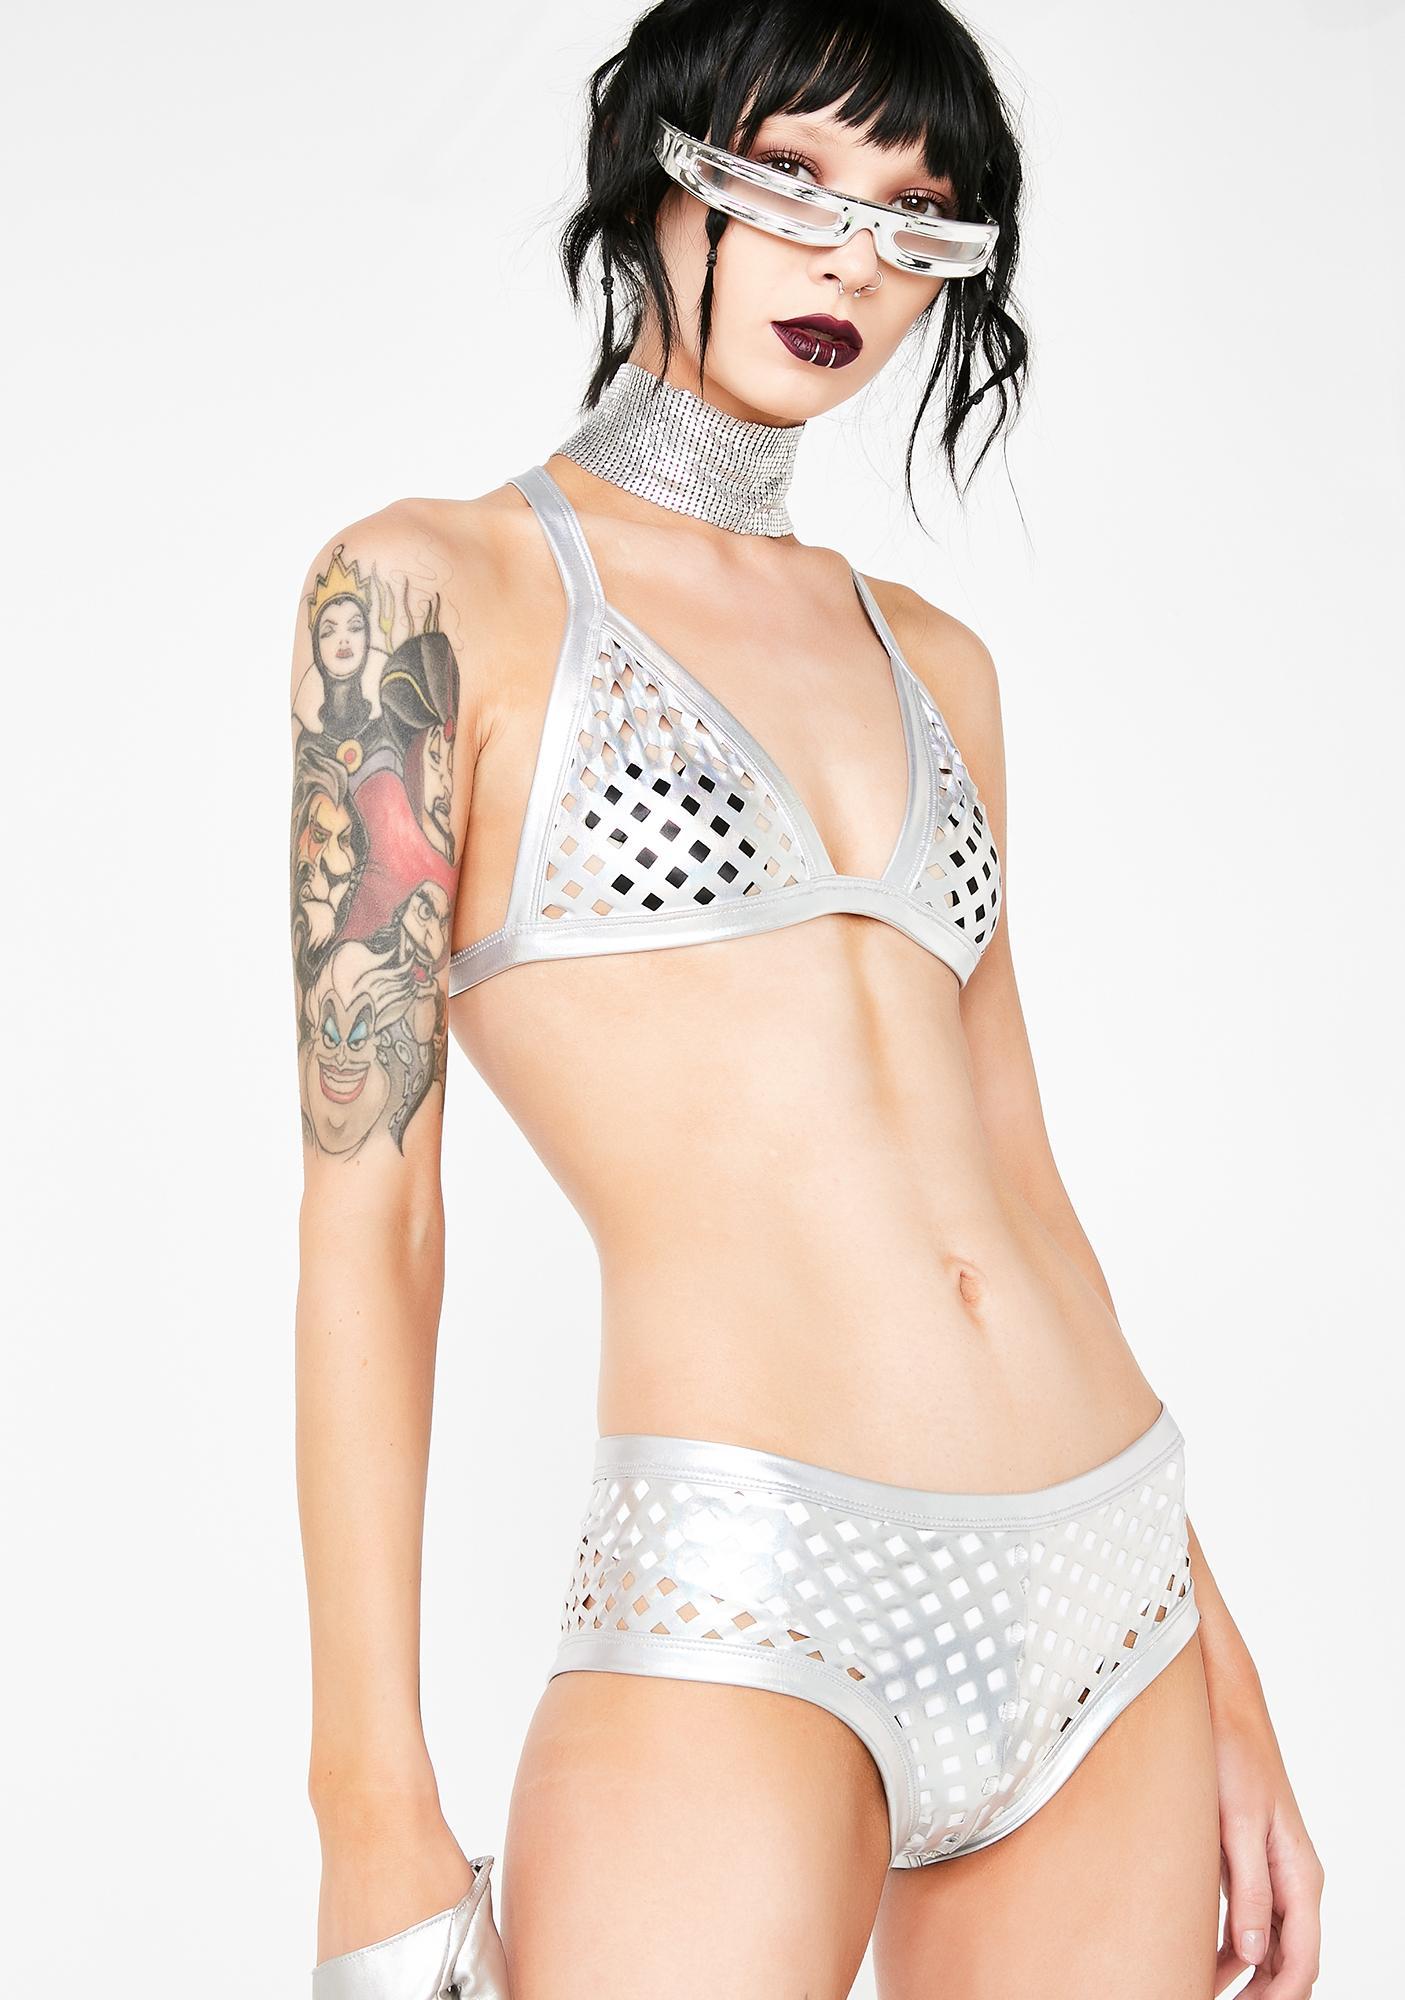 Club Exx Futuristic Mirage Metallic Shorts